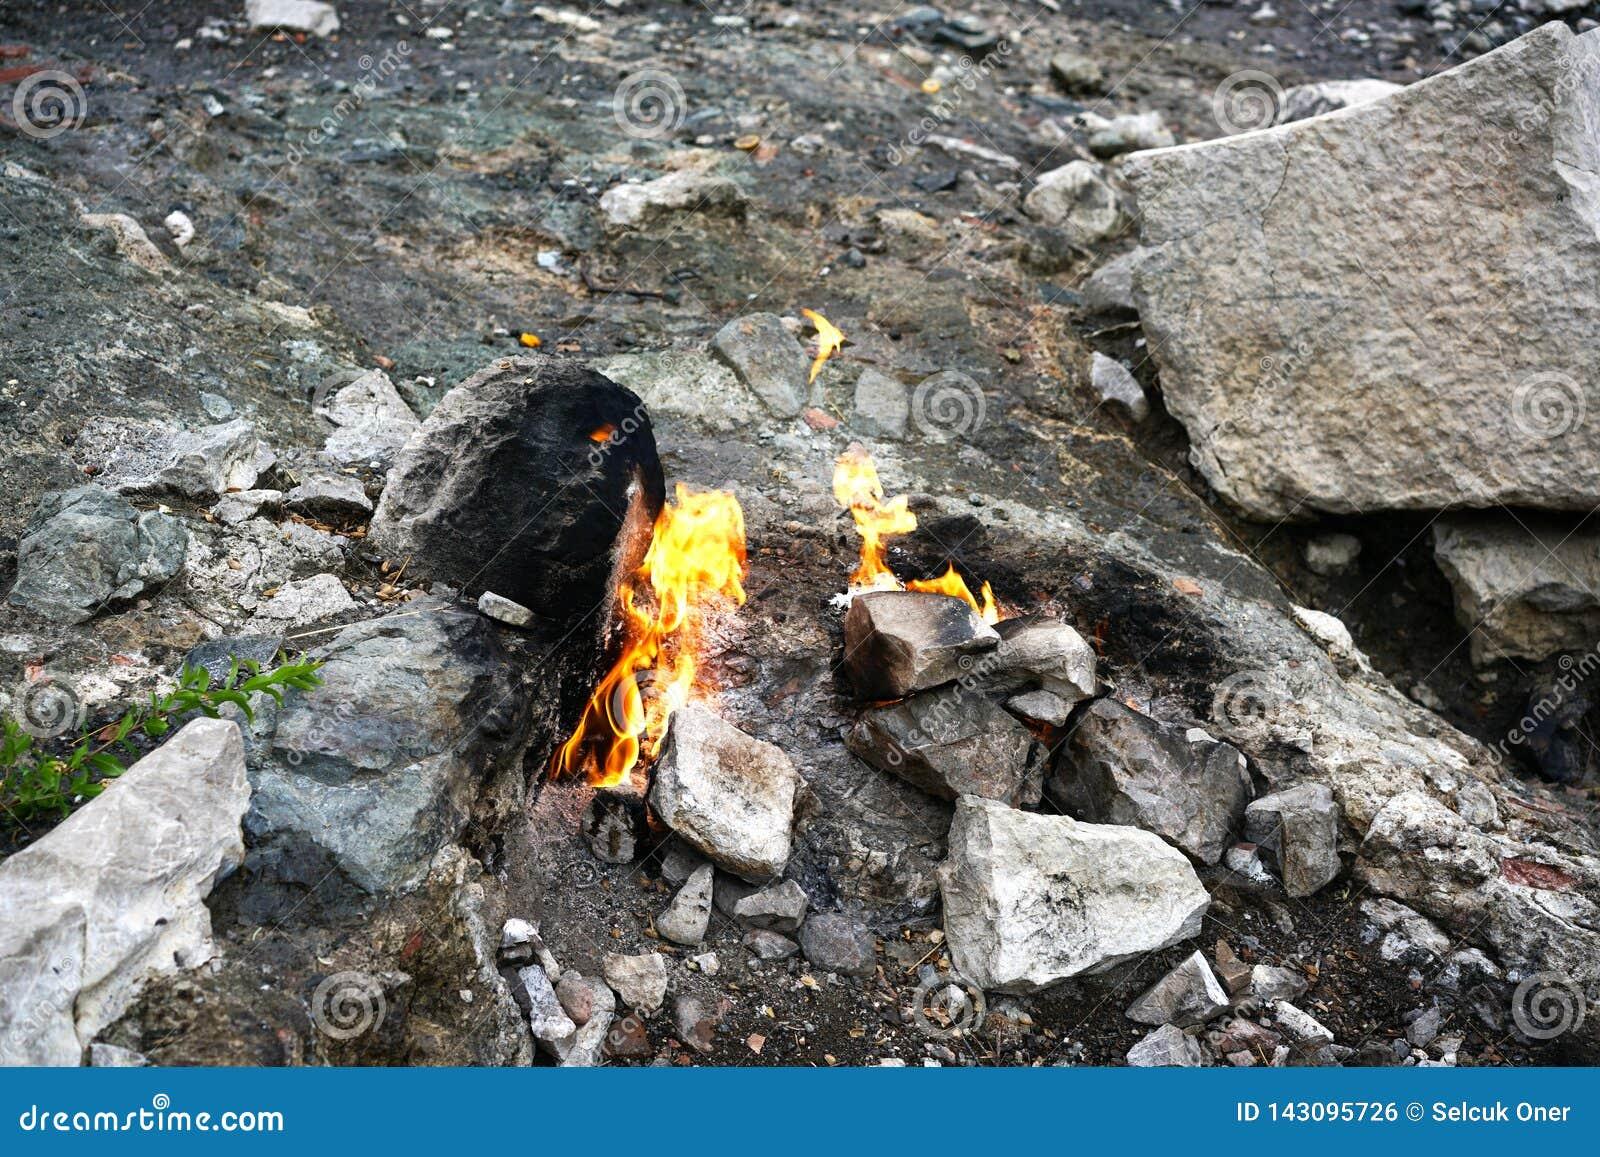 La chim?re, les roches br?lantes sont ot remarquable de tache la tra?n?e de la mani?re de Lycian pr?s de Cirali, Antaly